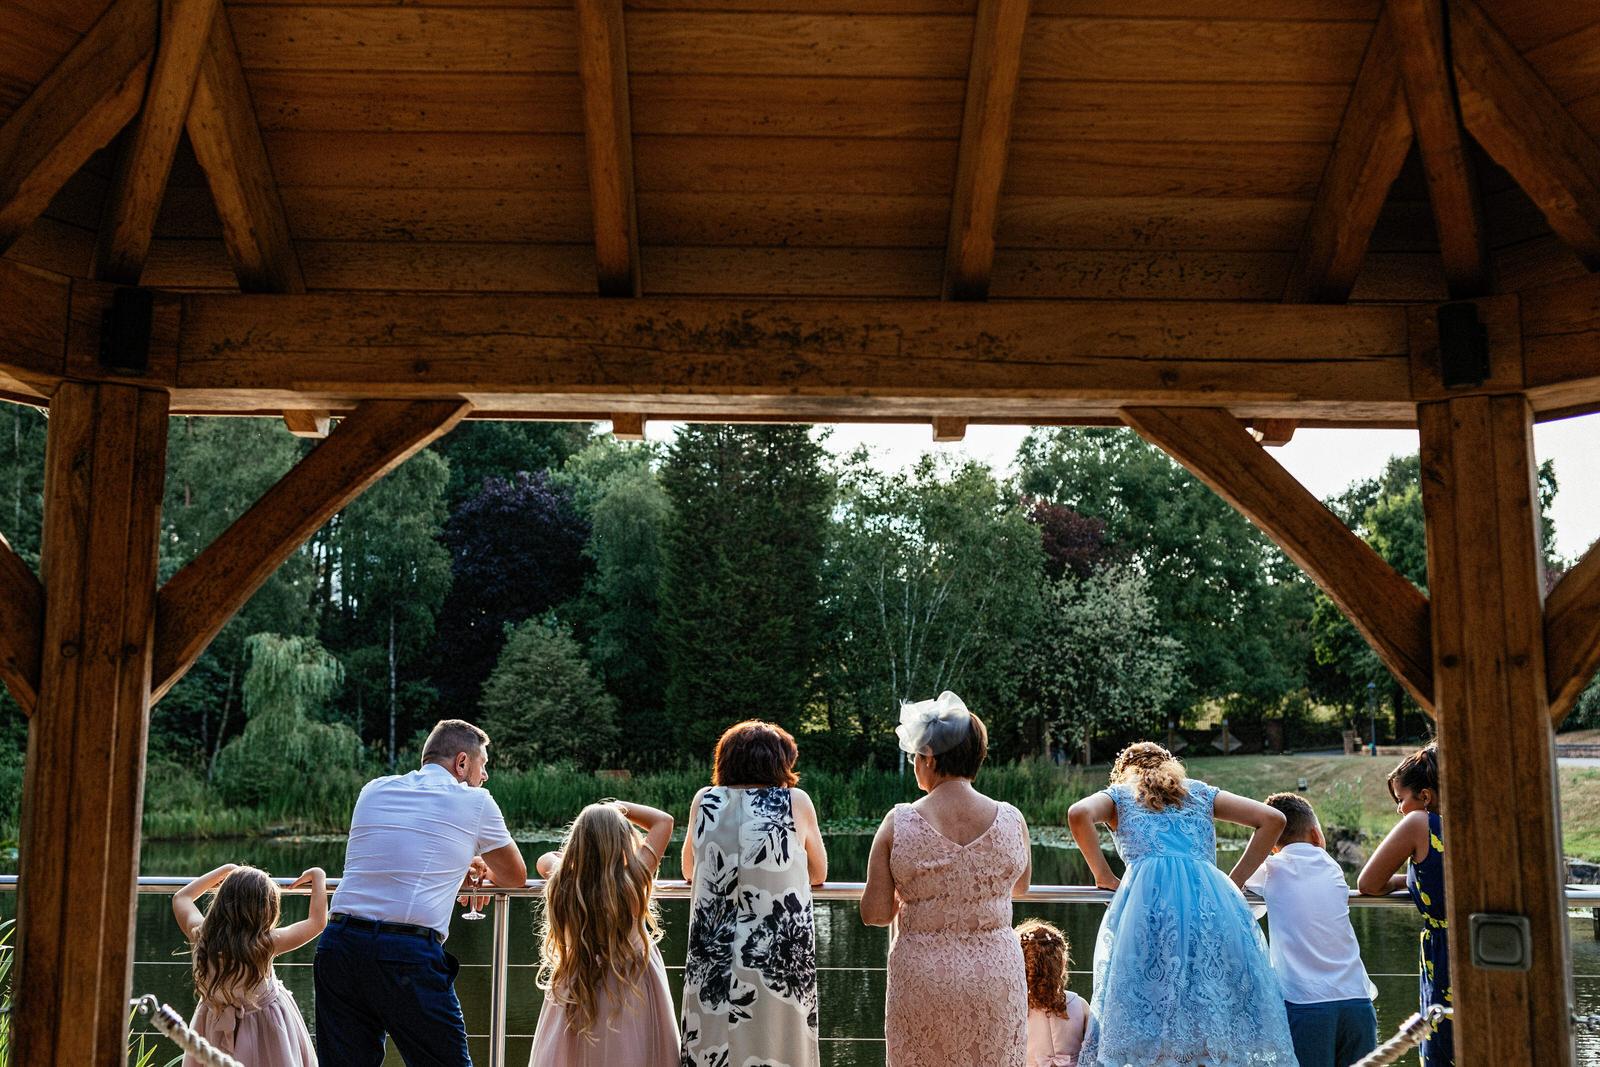 Moddershall-Oaks-Spa-Wedding-Photographer-060.jpg